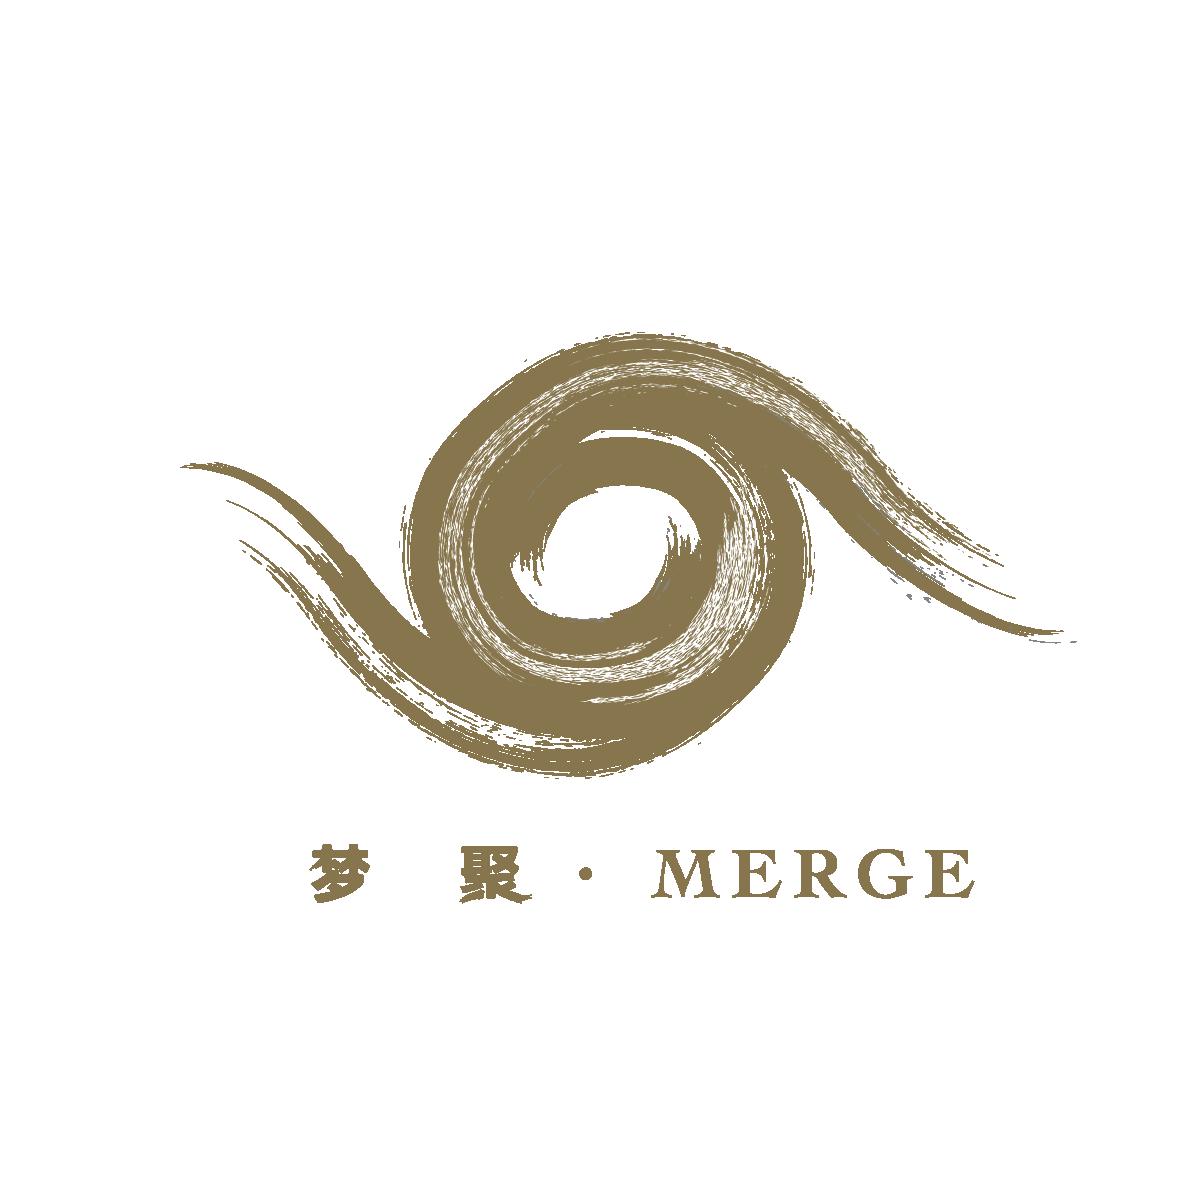 LOGO-金色-透明底-01.PNG